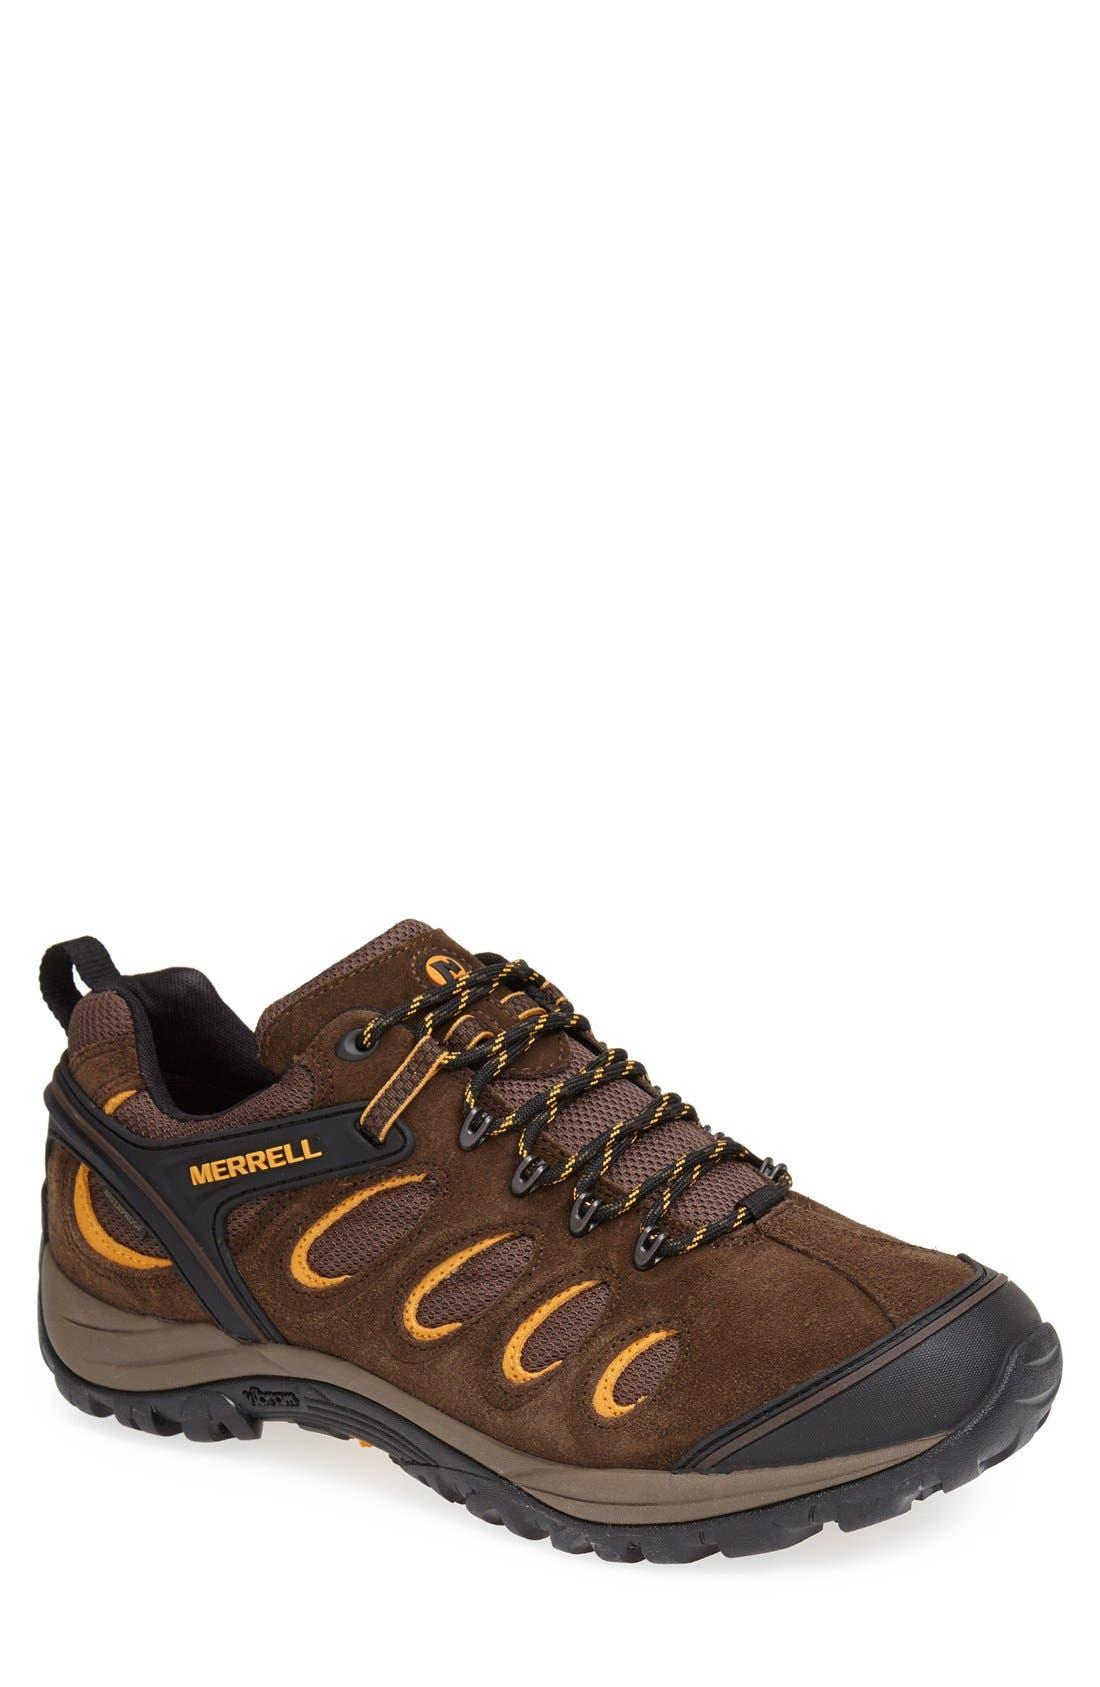 'Chameleon 5' Waterproof Hiking Shoe,                             Main thumbnail 1, color,                             200